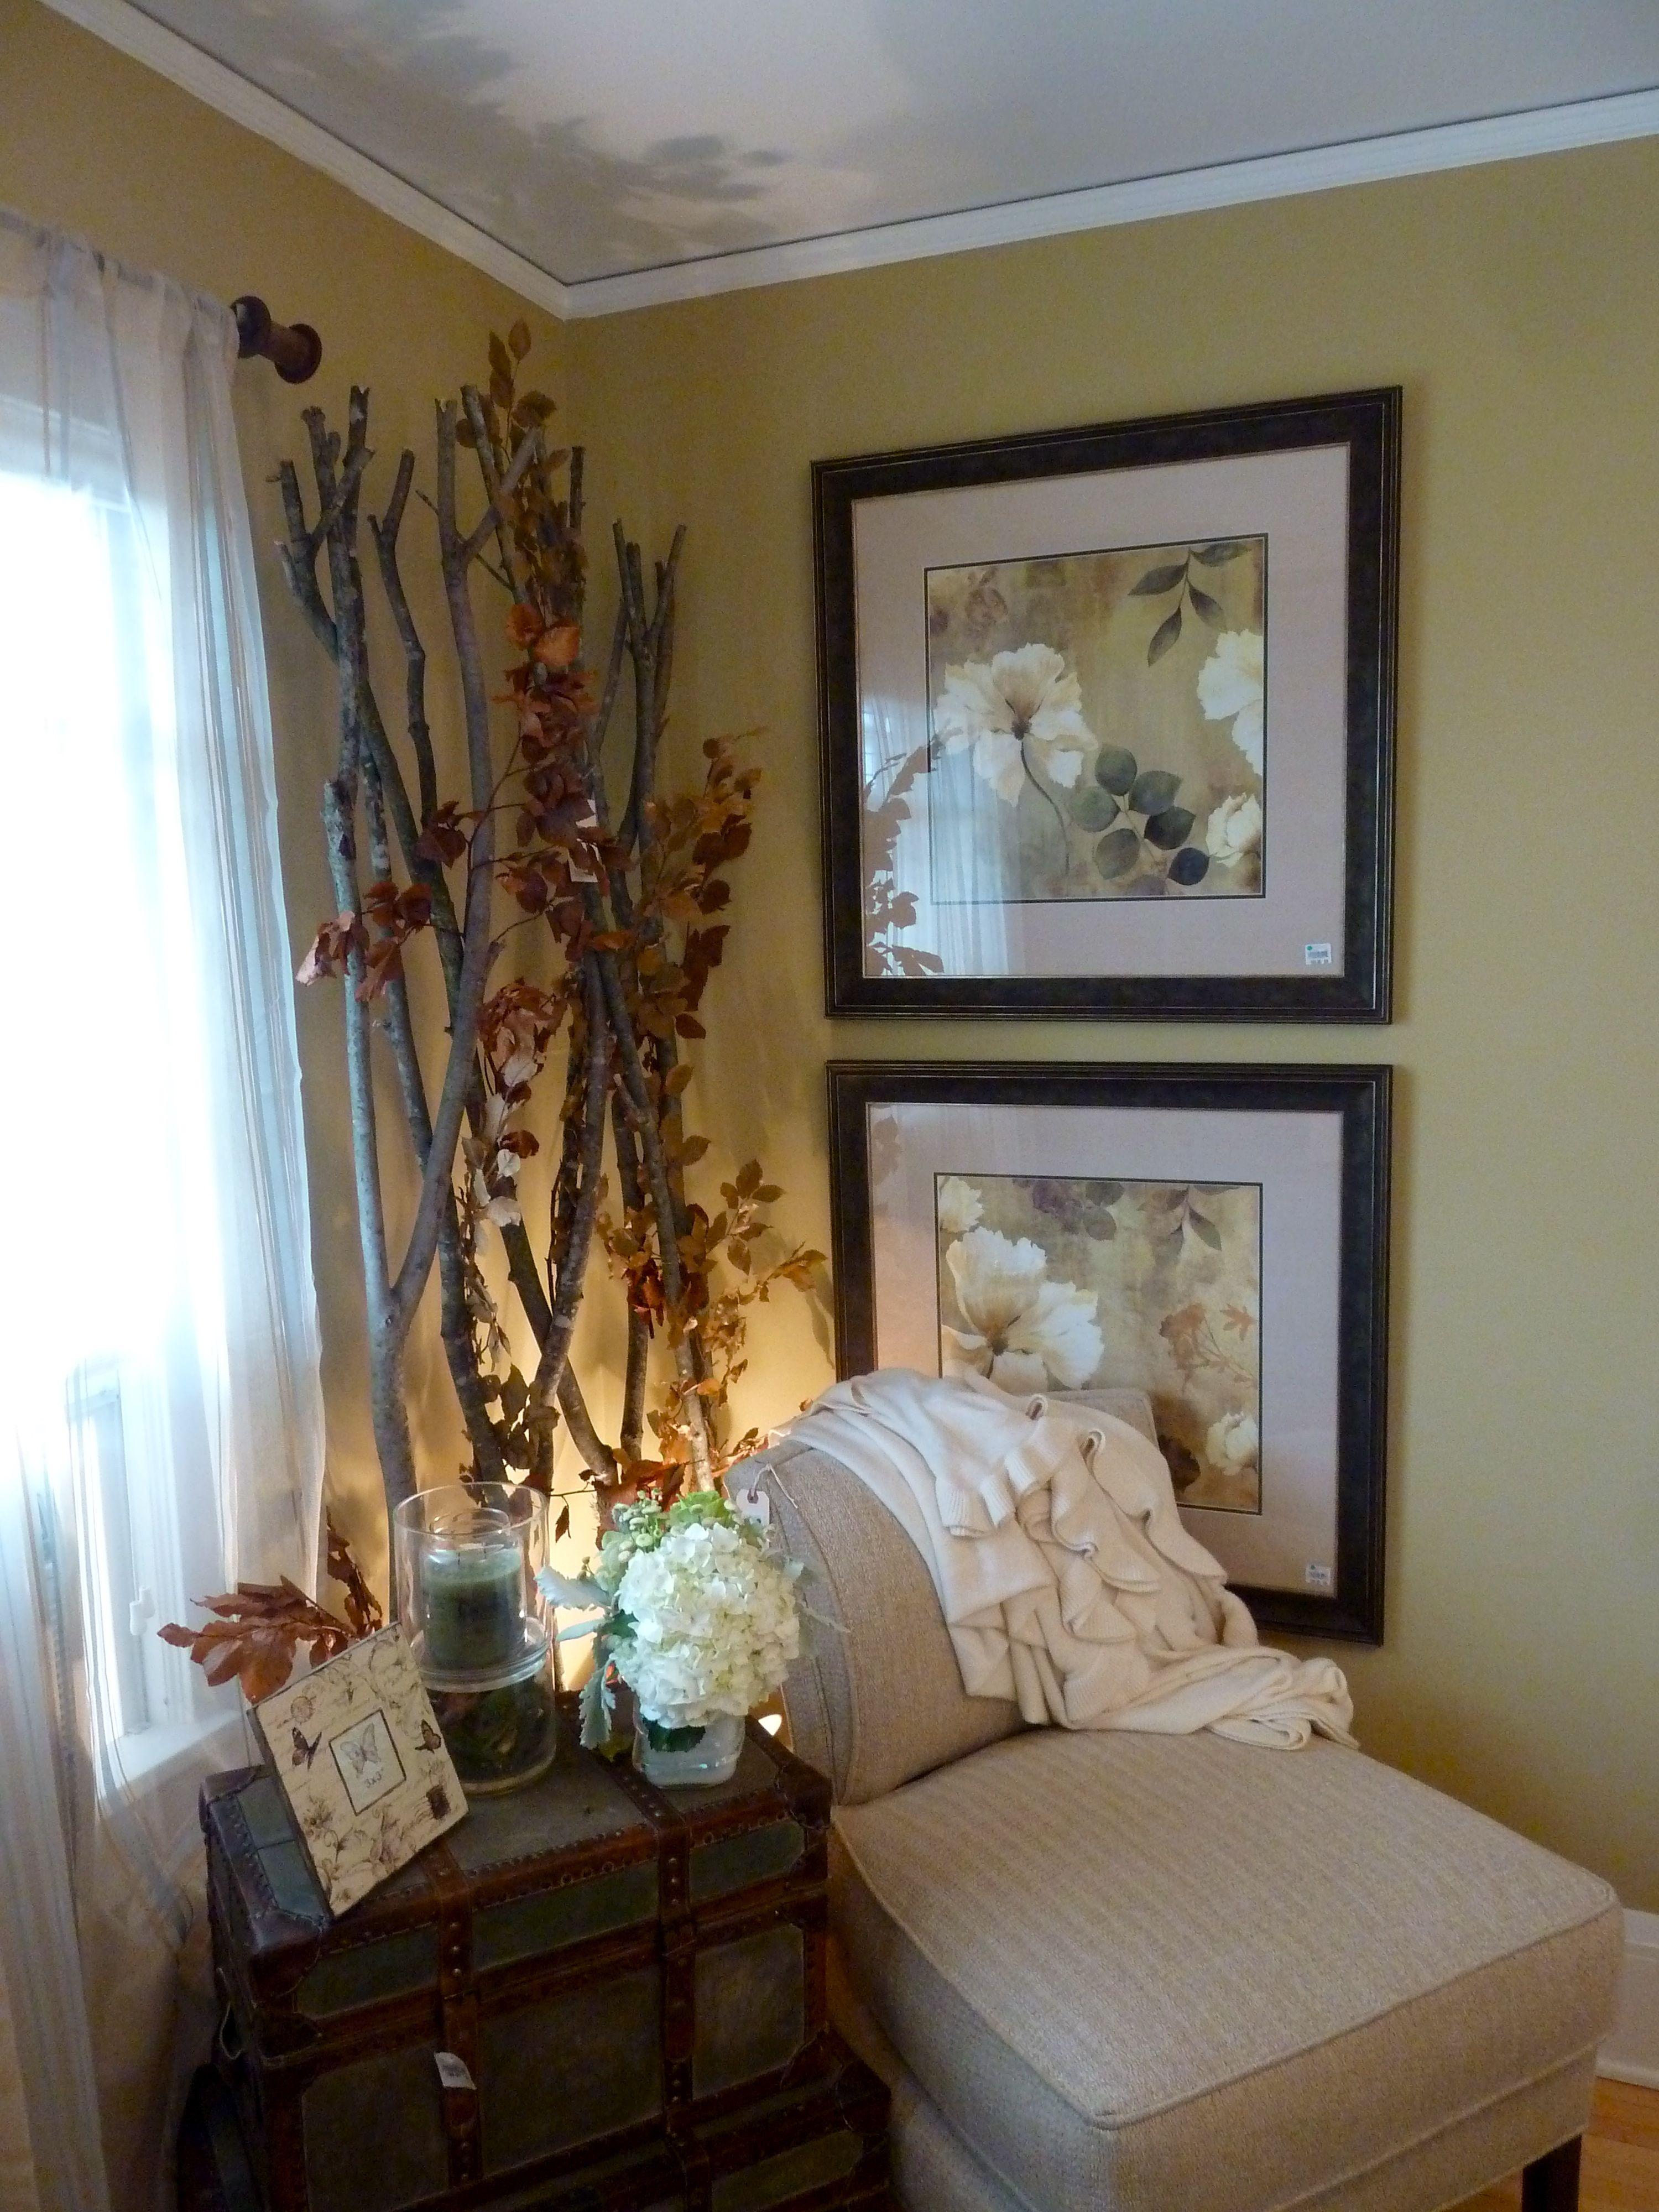 Master bedroom green paint ideas  Hirshfieldus Paint  Green Gold Bachmanus Fall Ideas House